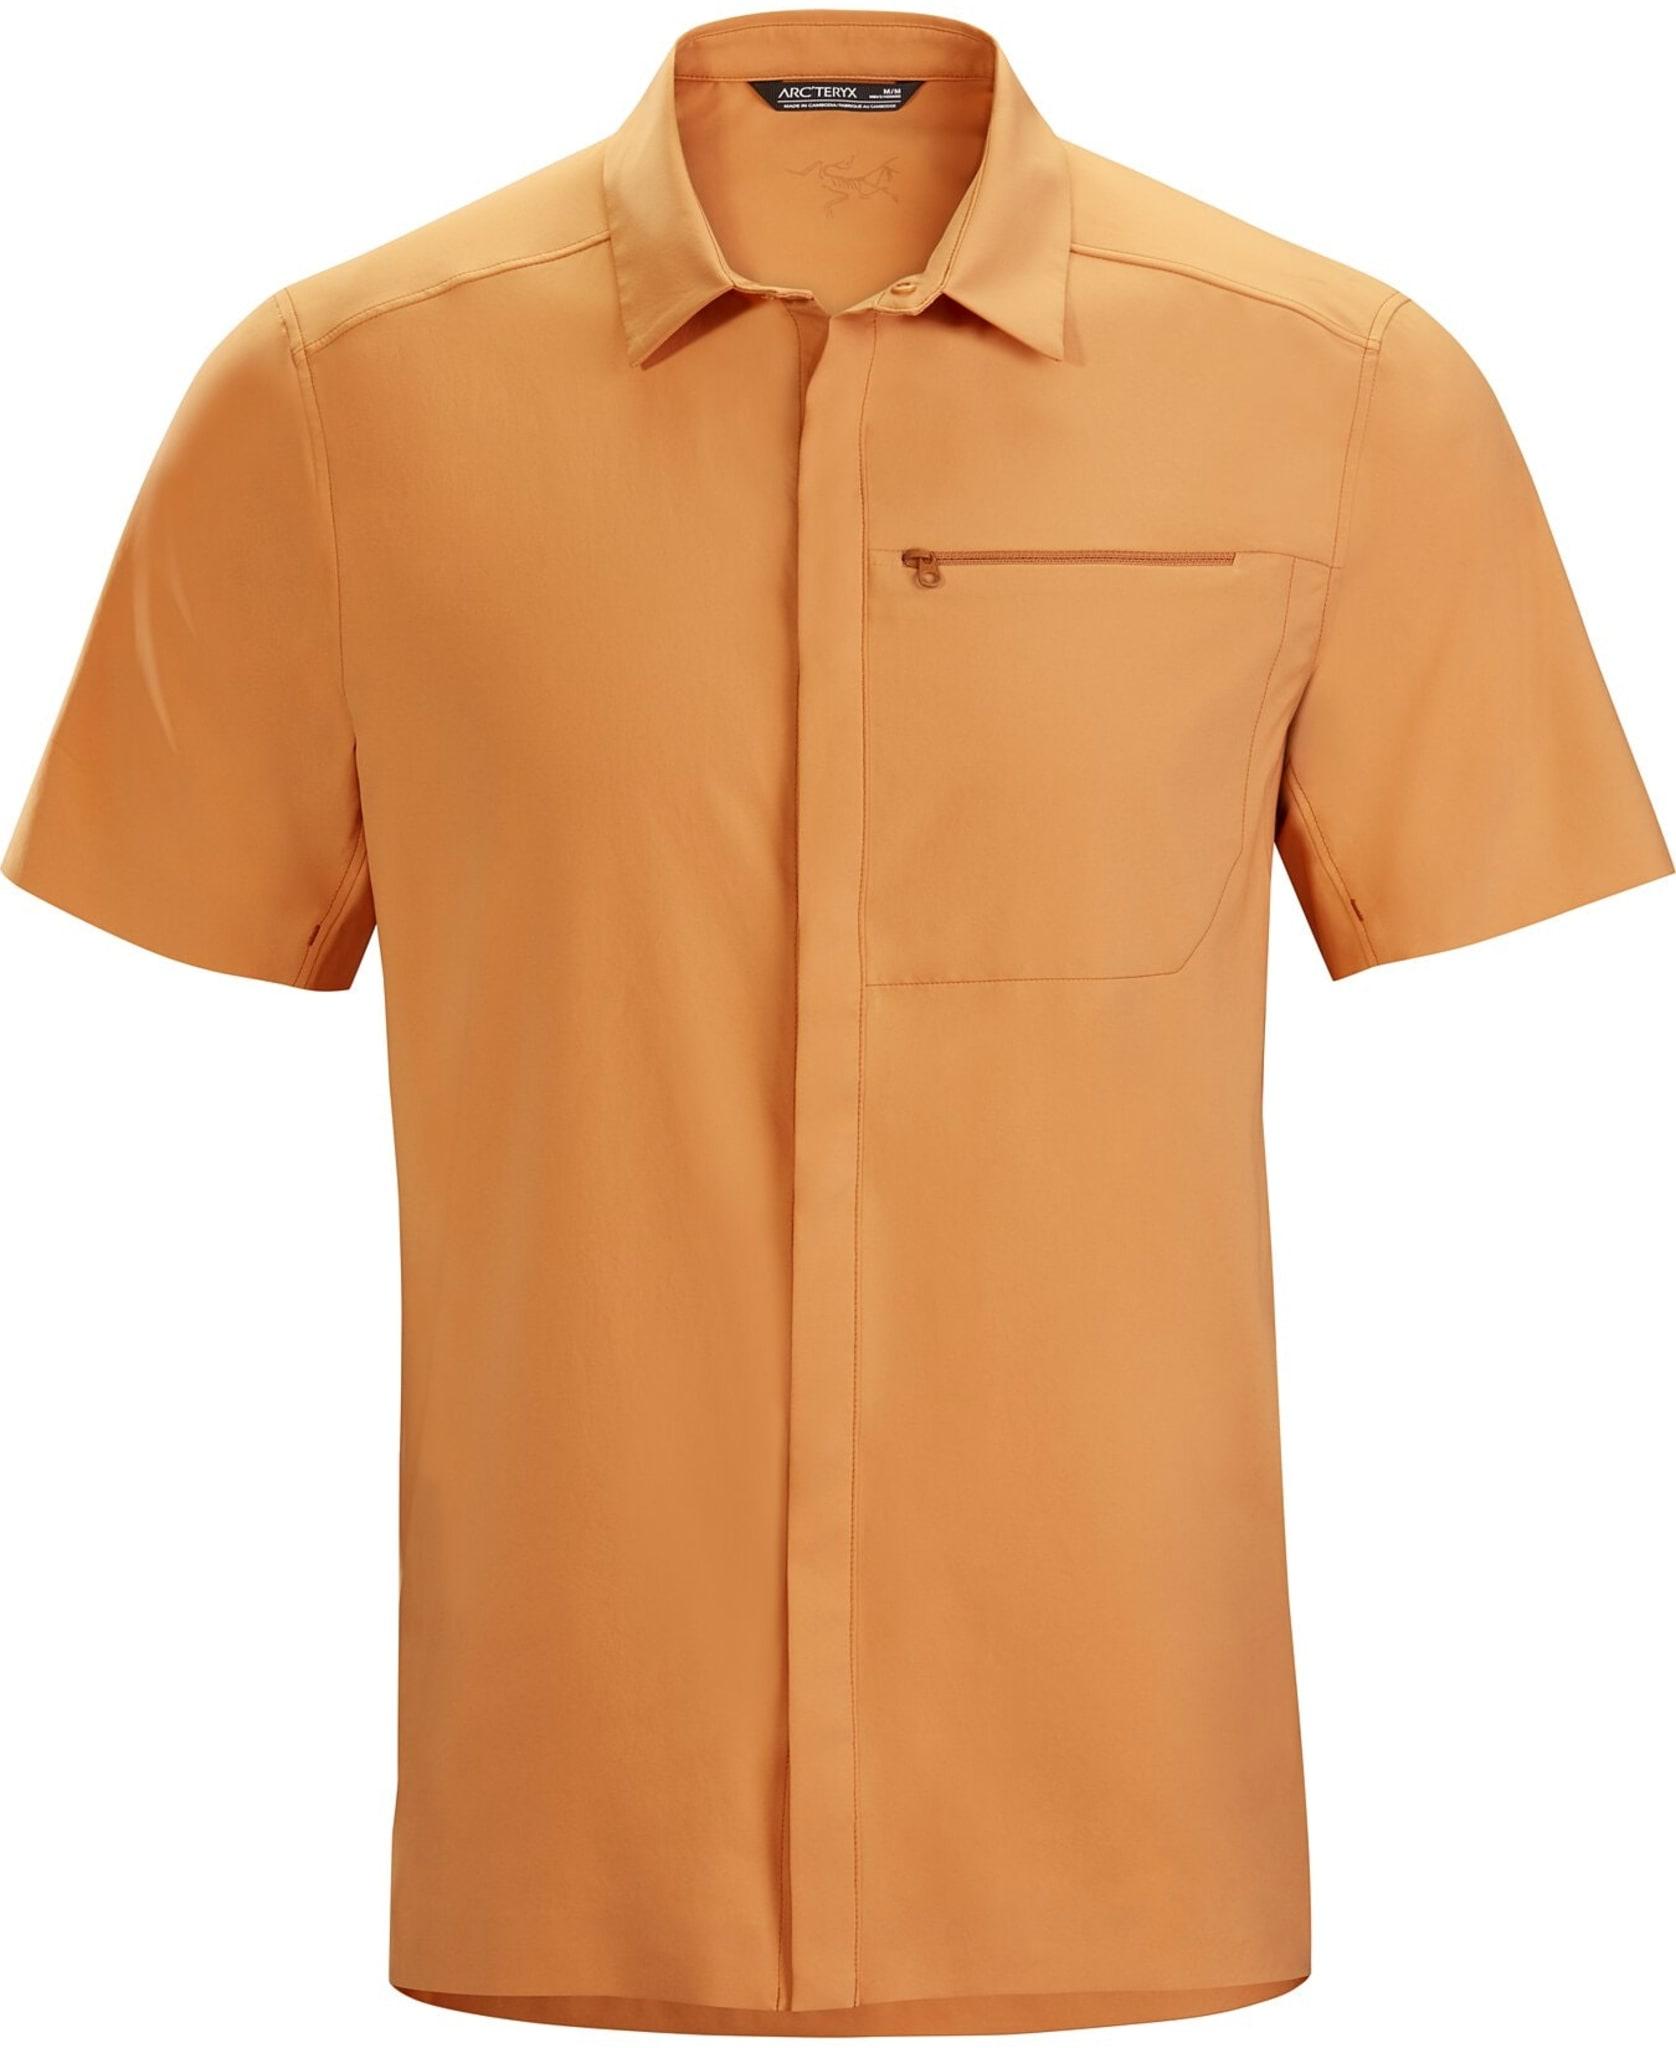 Skyline SS Shirt Ms